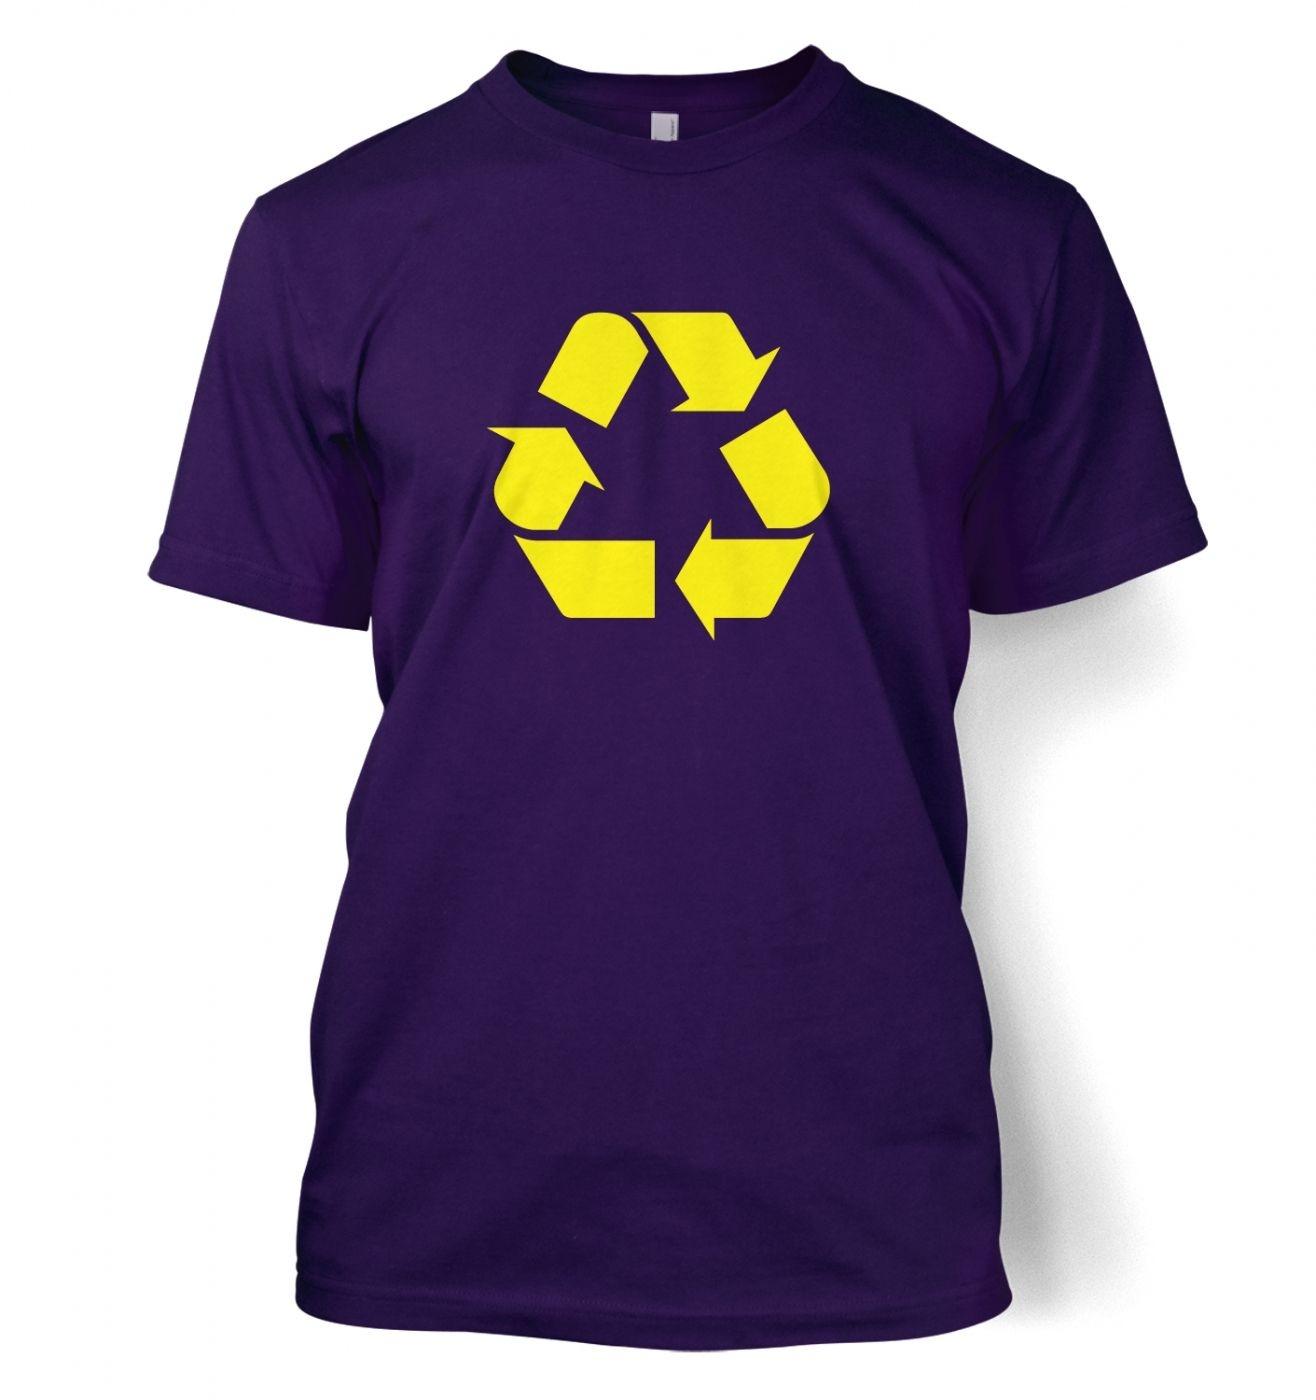 Yellow Recycling Symbol T-Shirt